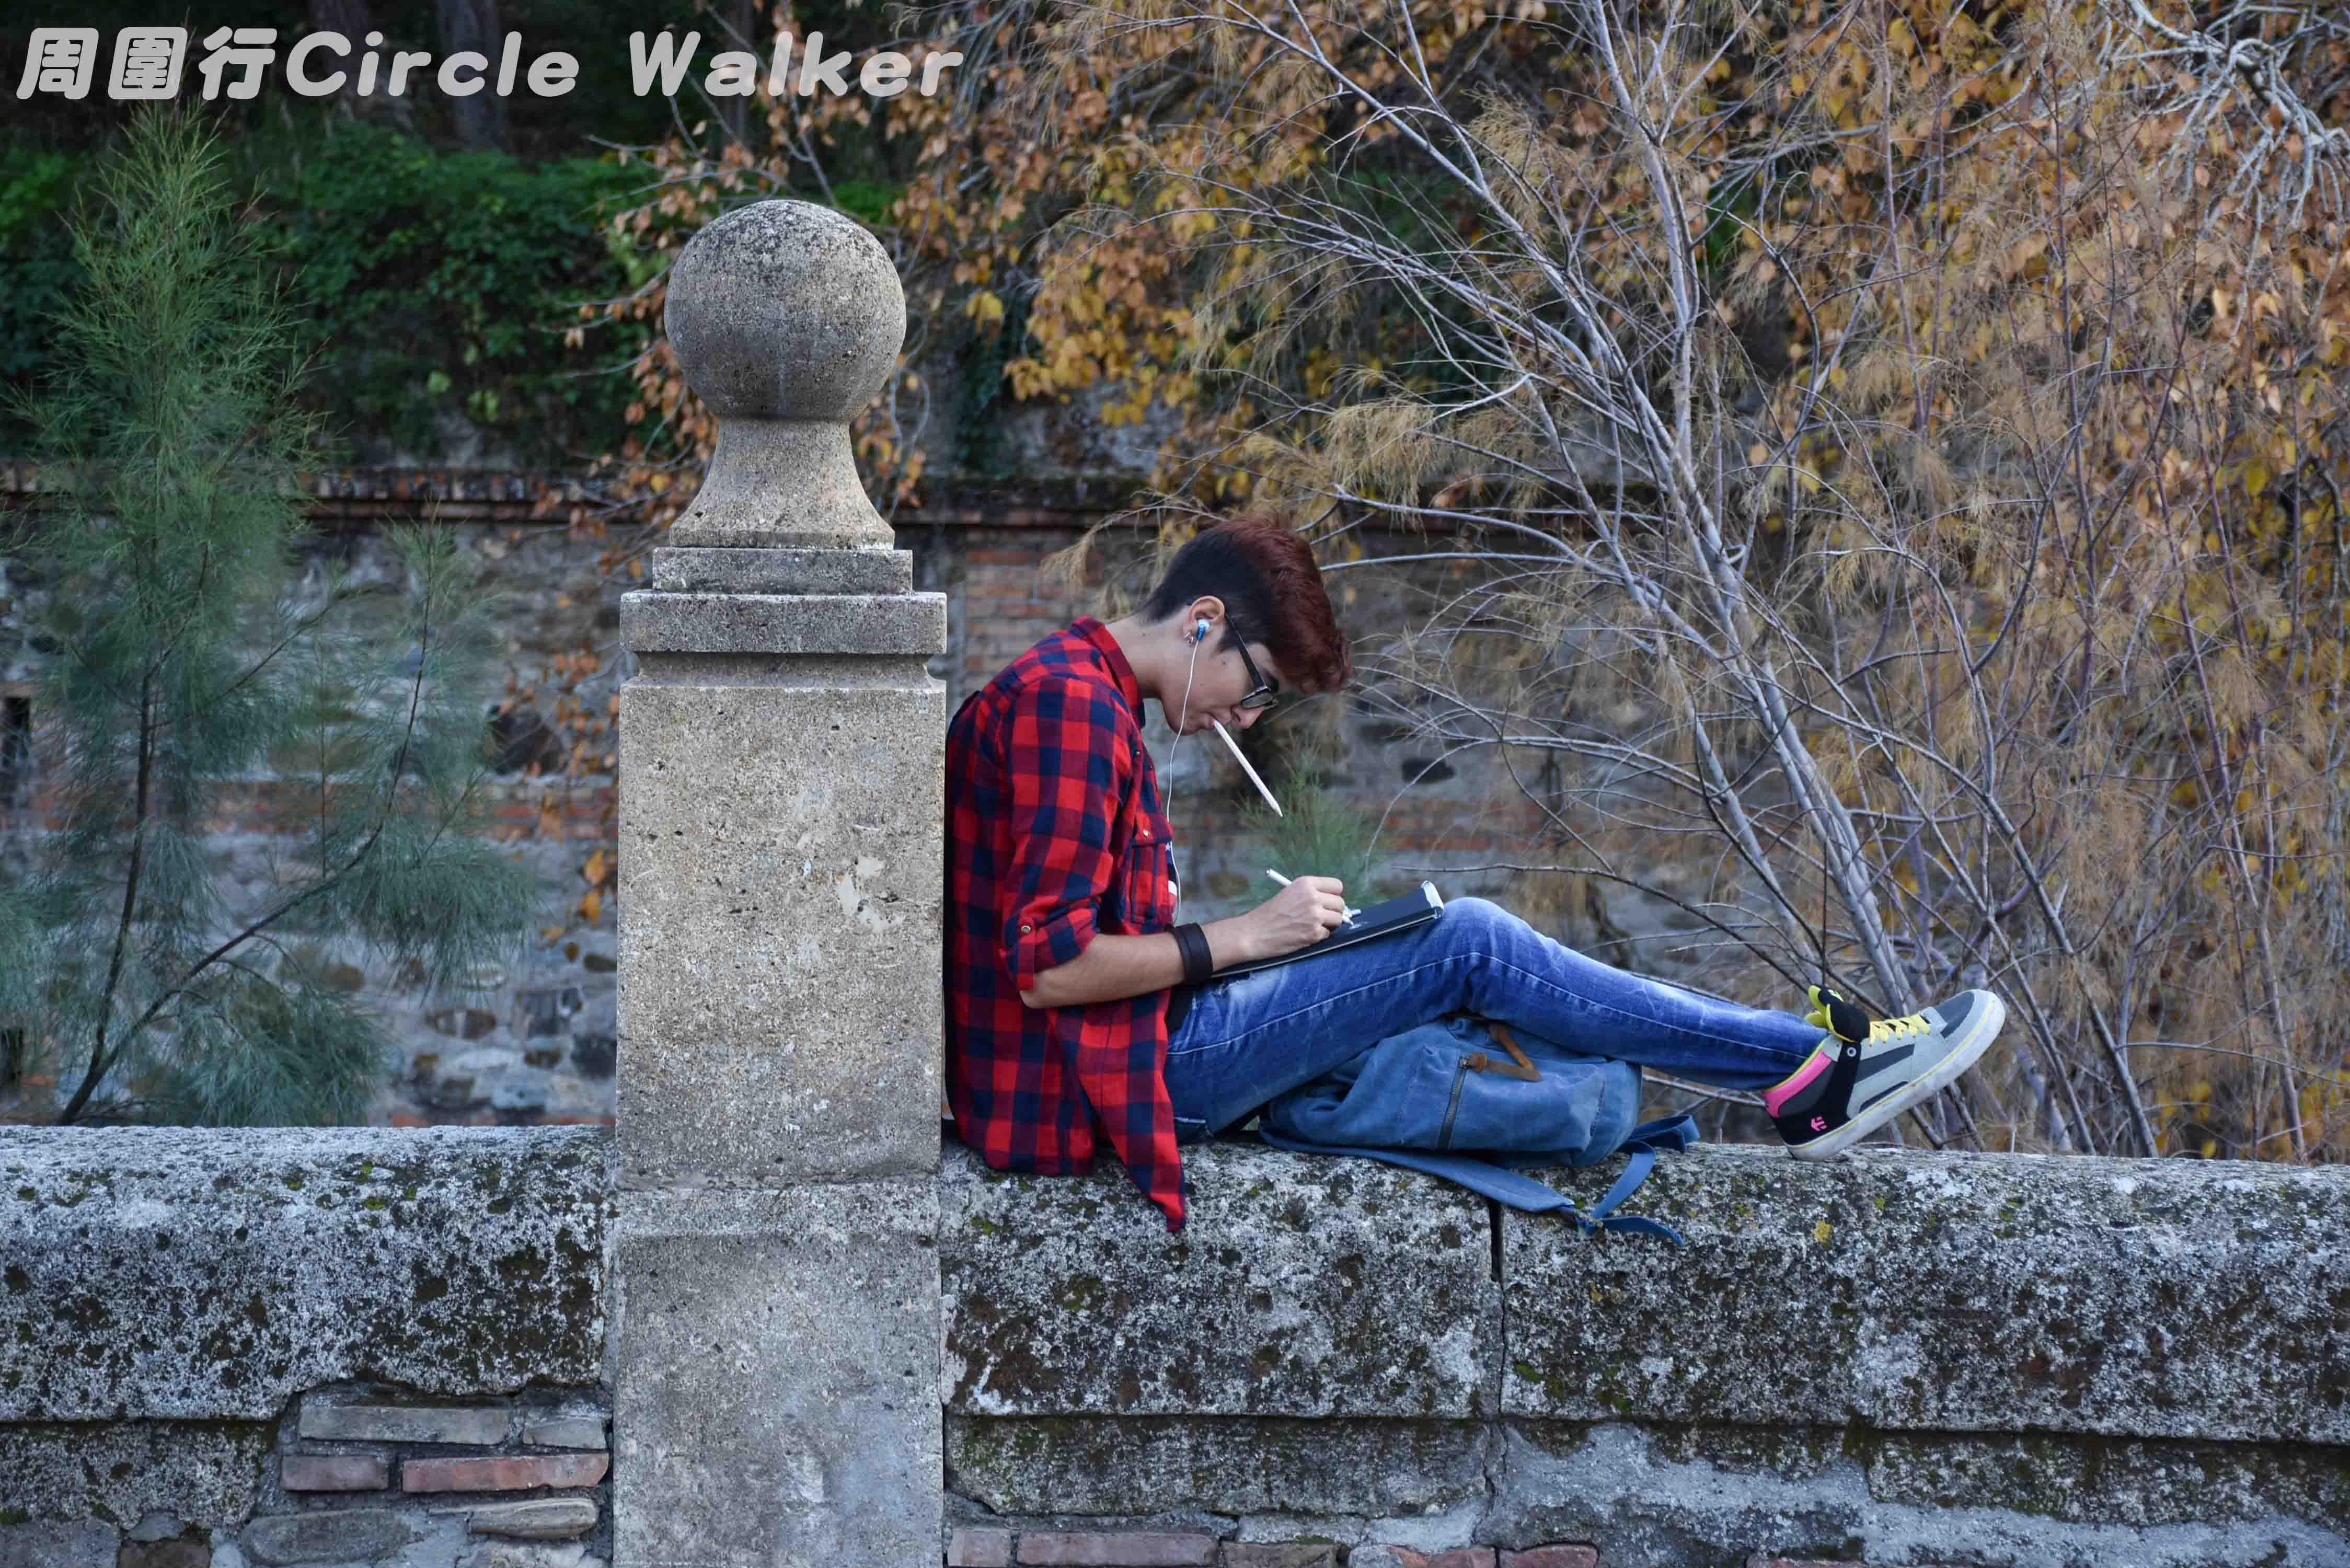 """Human who READ讀書人""  Alhambra, Granada, Spain 西班牙,格拉納達, 阿爾罕布拉宮 . More on: https://www.circlewalker.me/human-who-read . #Alhambra #Granada #Spain #西班牙 #格拉納達 #阿爾罕布拉宮 #人 #people #human #photo #foto #photography #攝影 #art #藝術 #CS6 #photoshop #camera #nikon #figure #book #read #讀 #書 #reader #author #alone #eu #europe #歐洲"